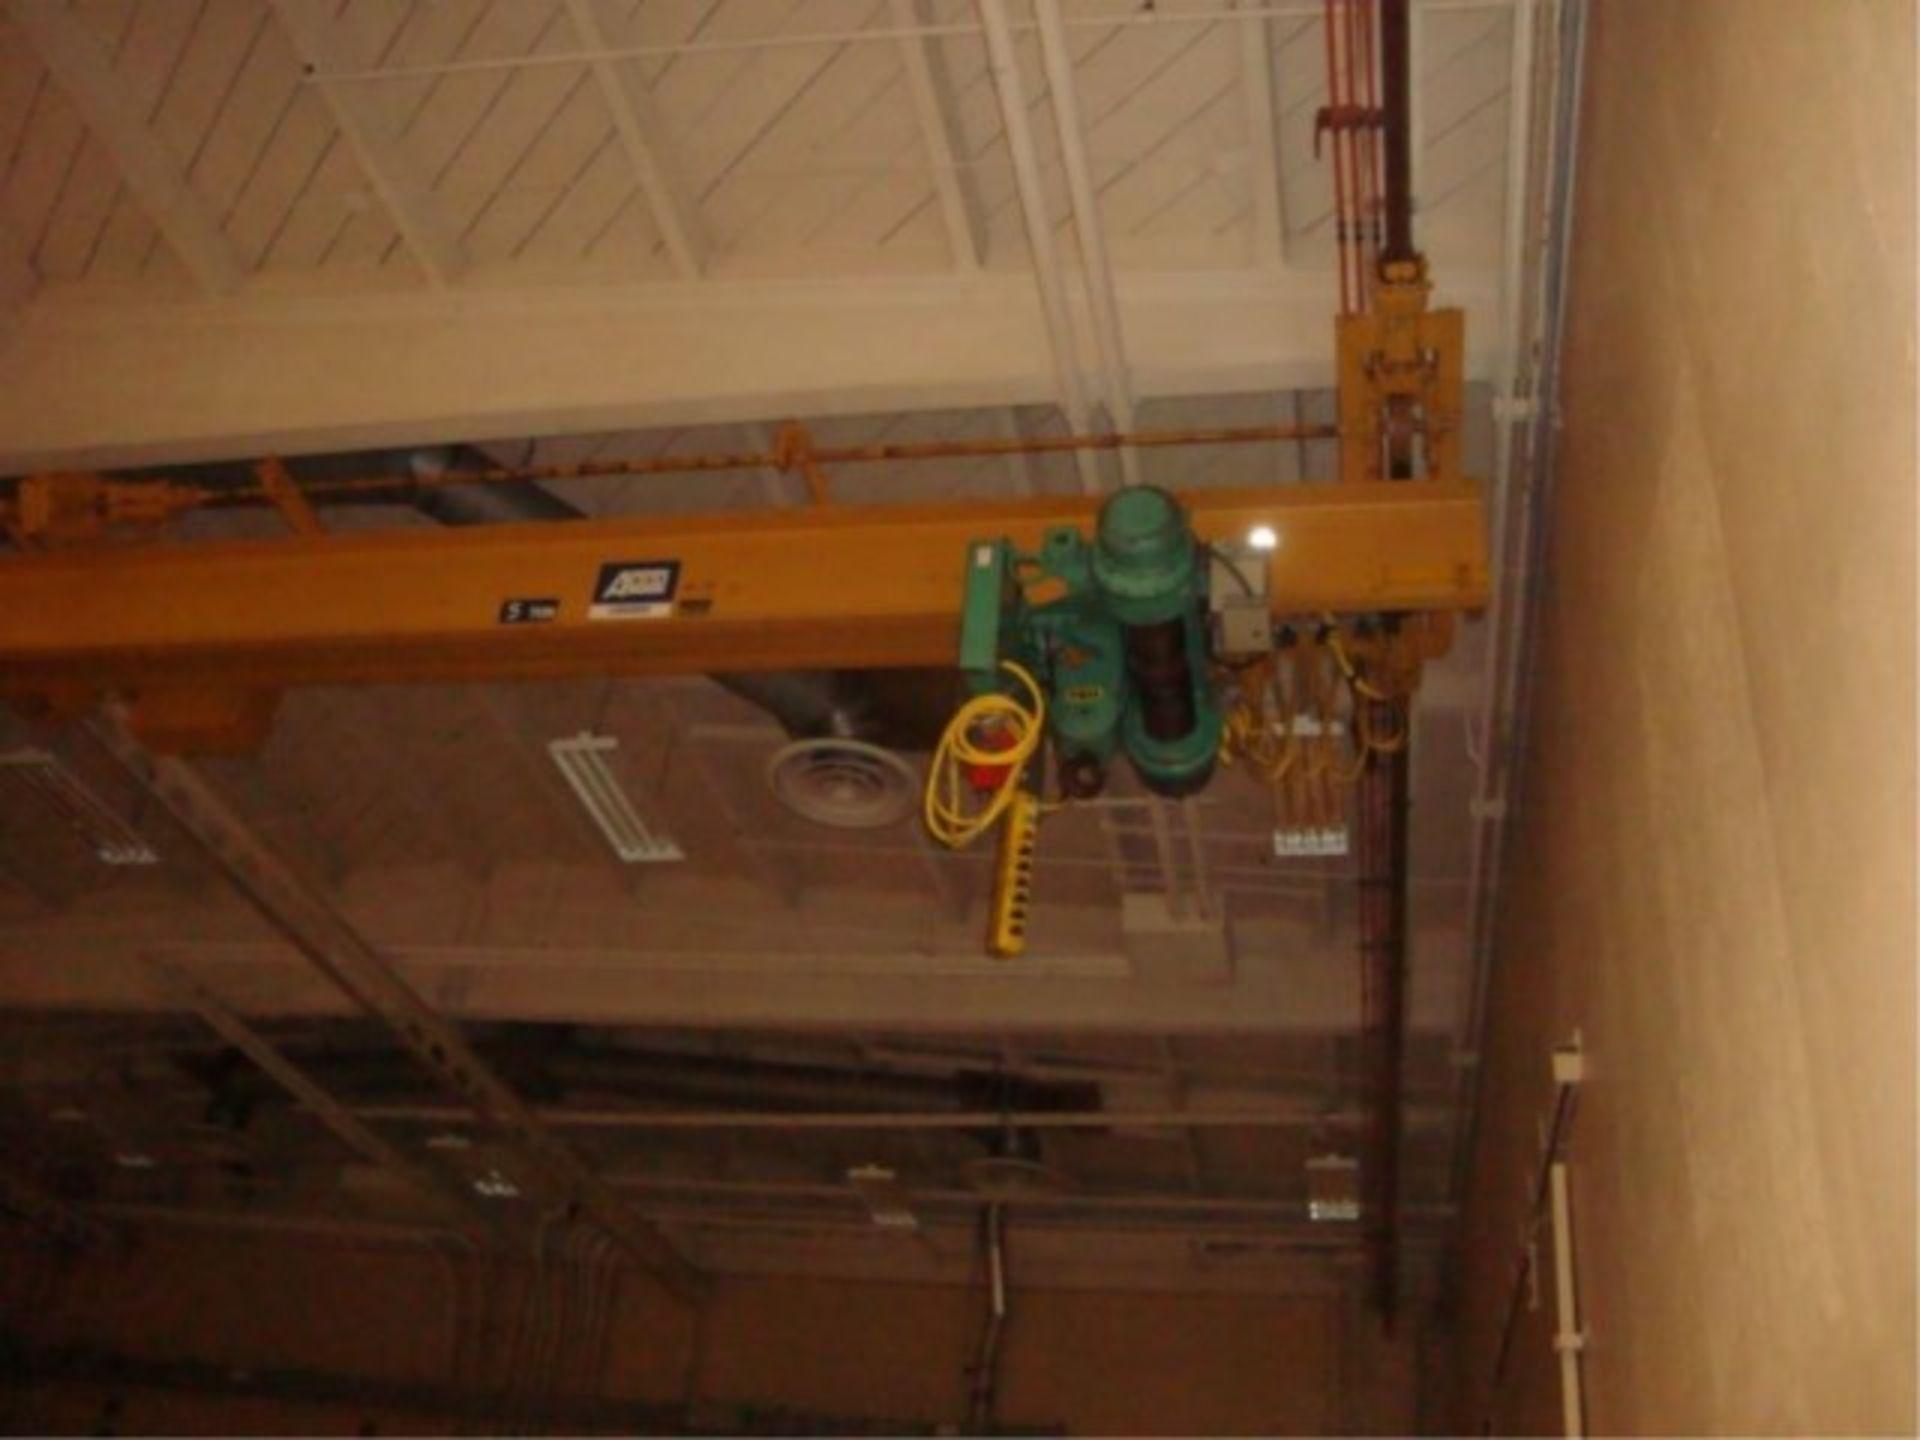 Lot 112 - 5-Ton Capacity Overhead Bridge Crane